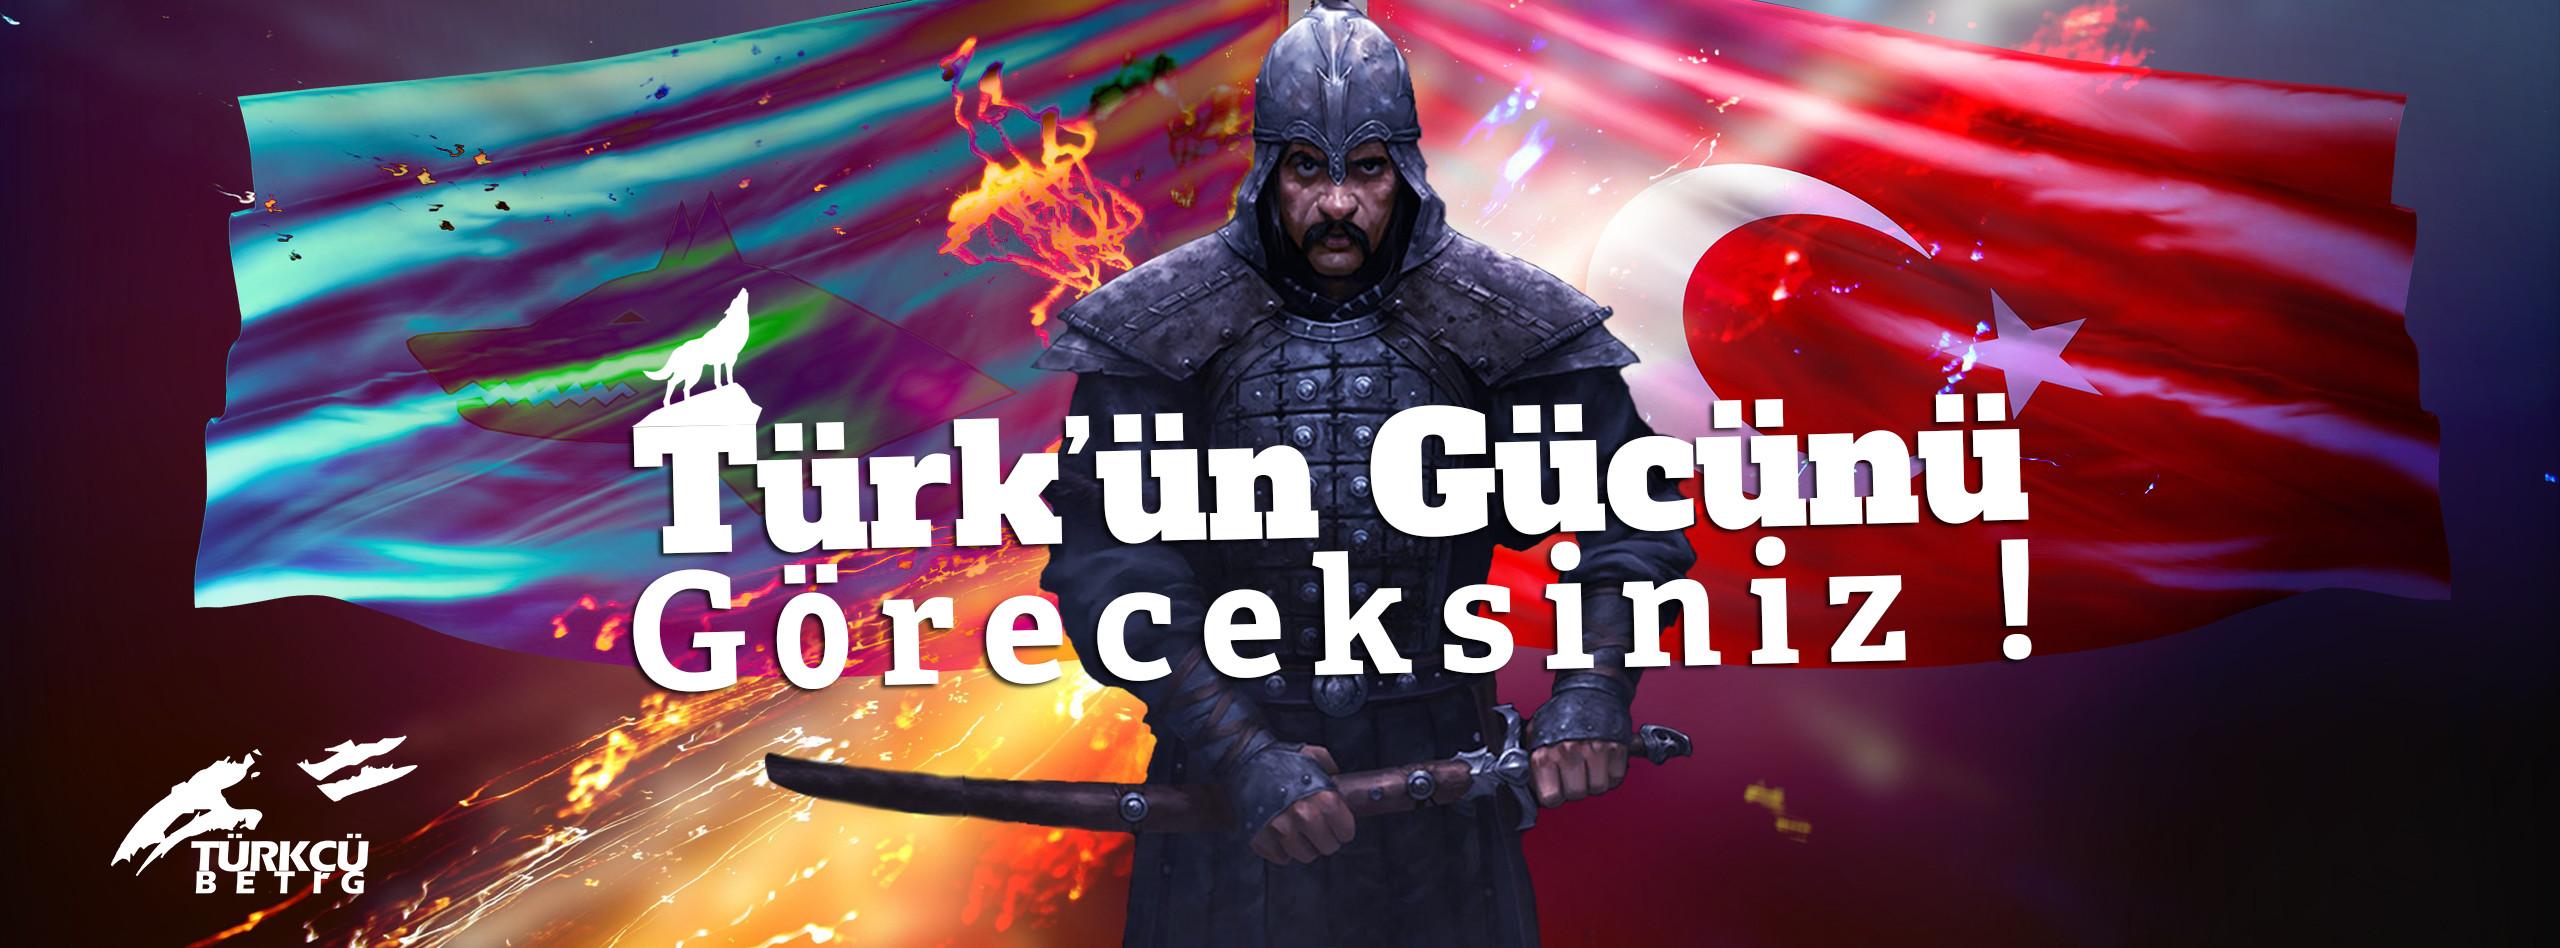 türkün gücünü